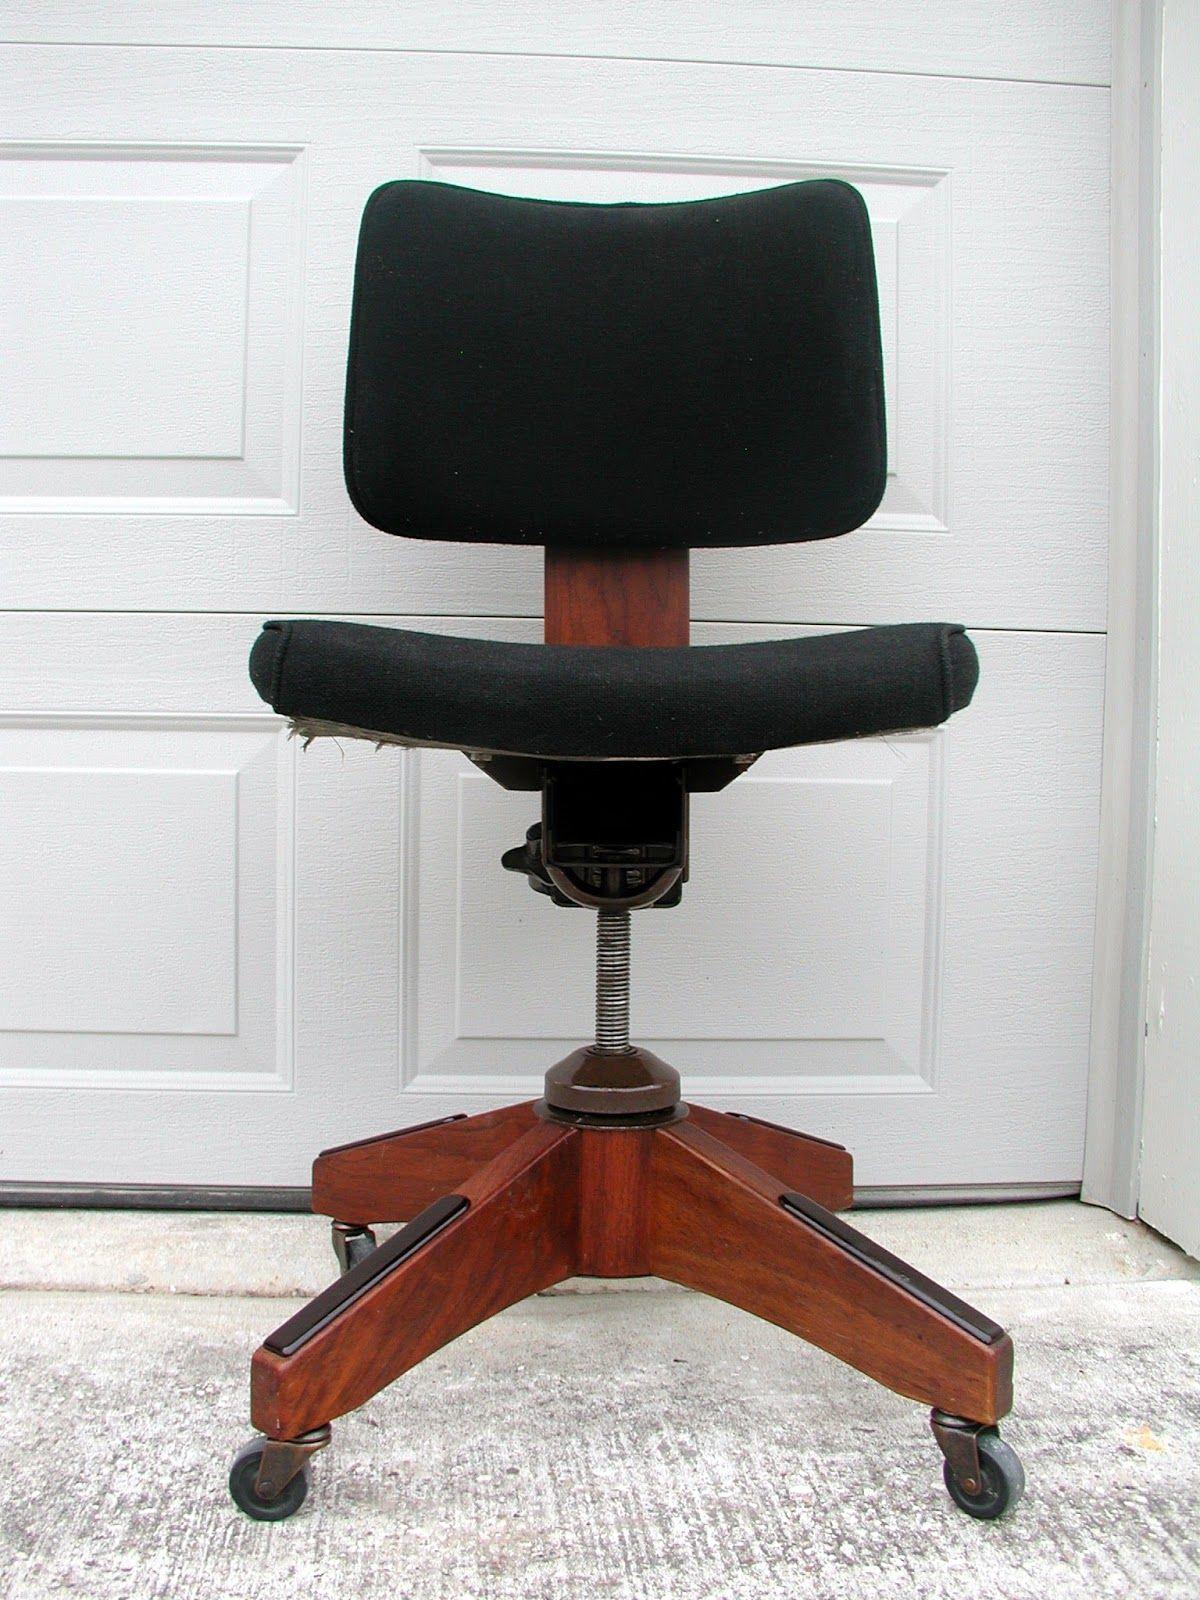 Image Result For Mid Century Modern Desk Chair Mid Century Modern Desk Chair Modern Desk Chair Comfortable Desk